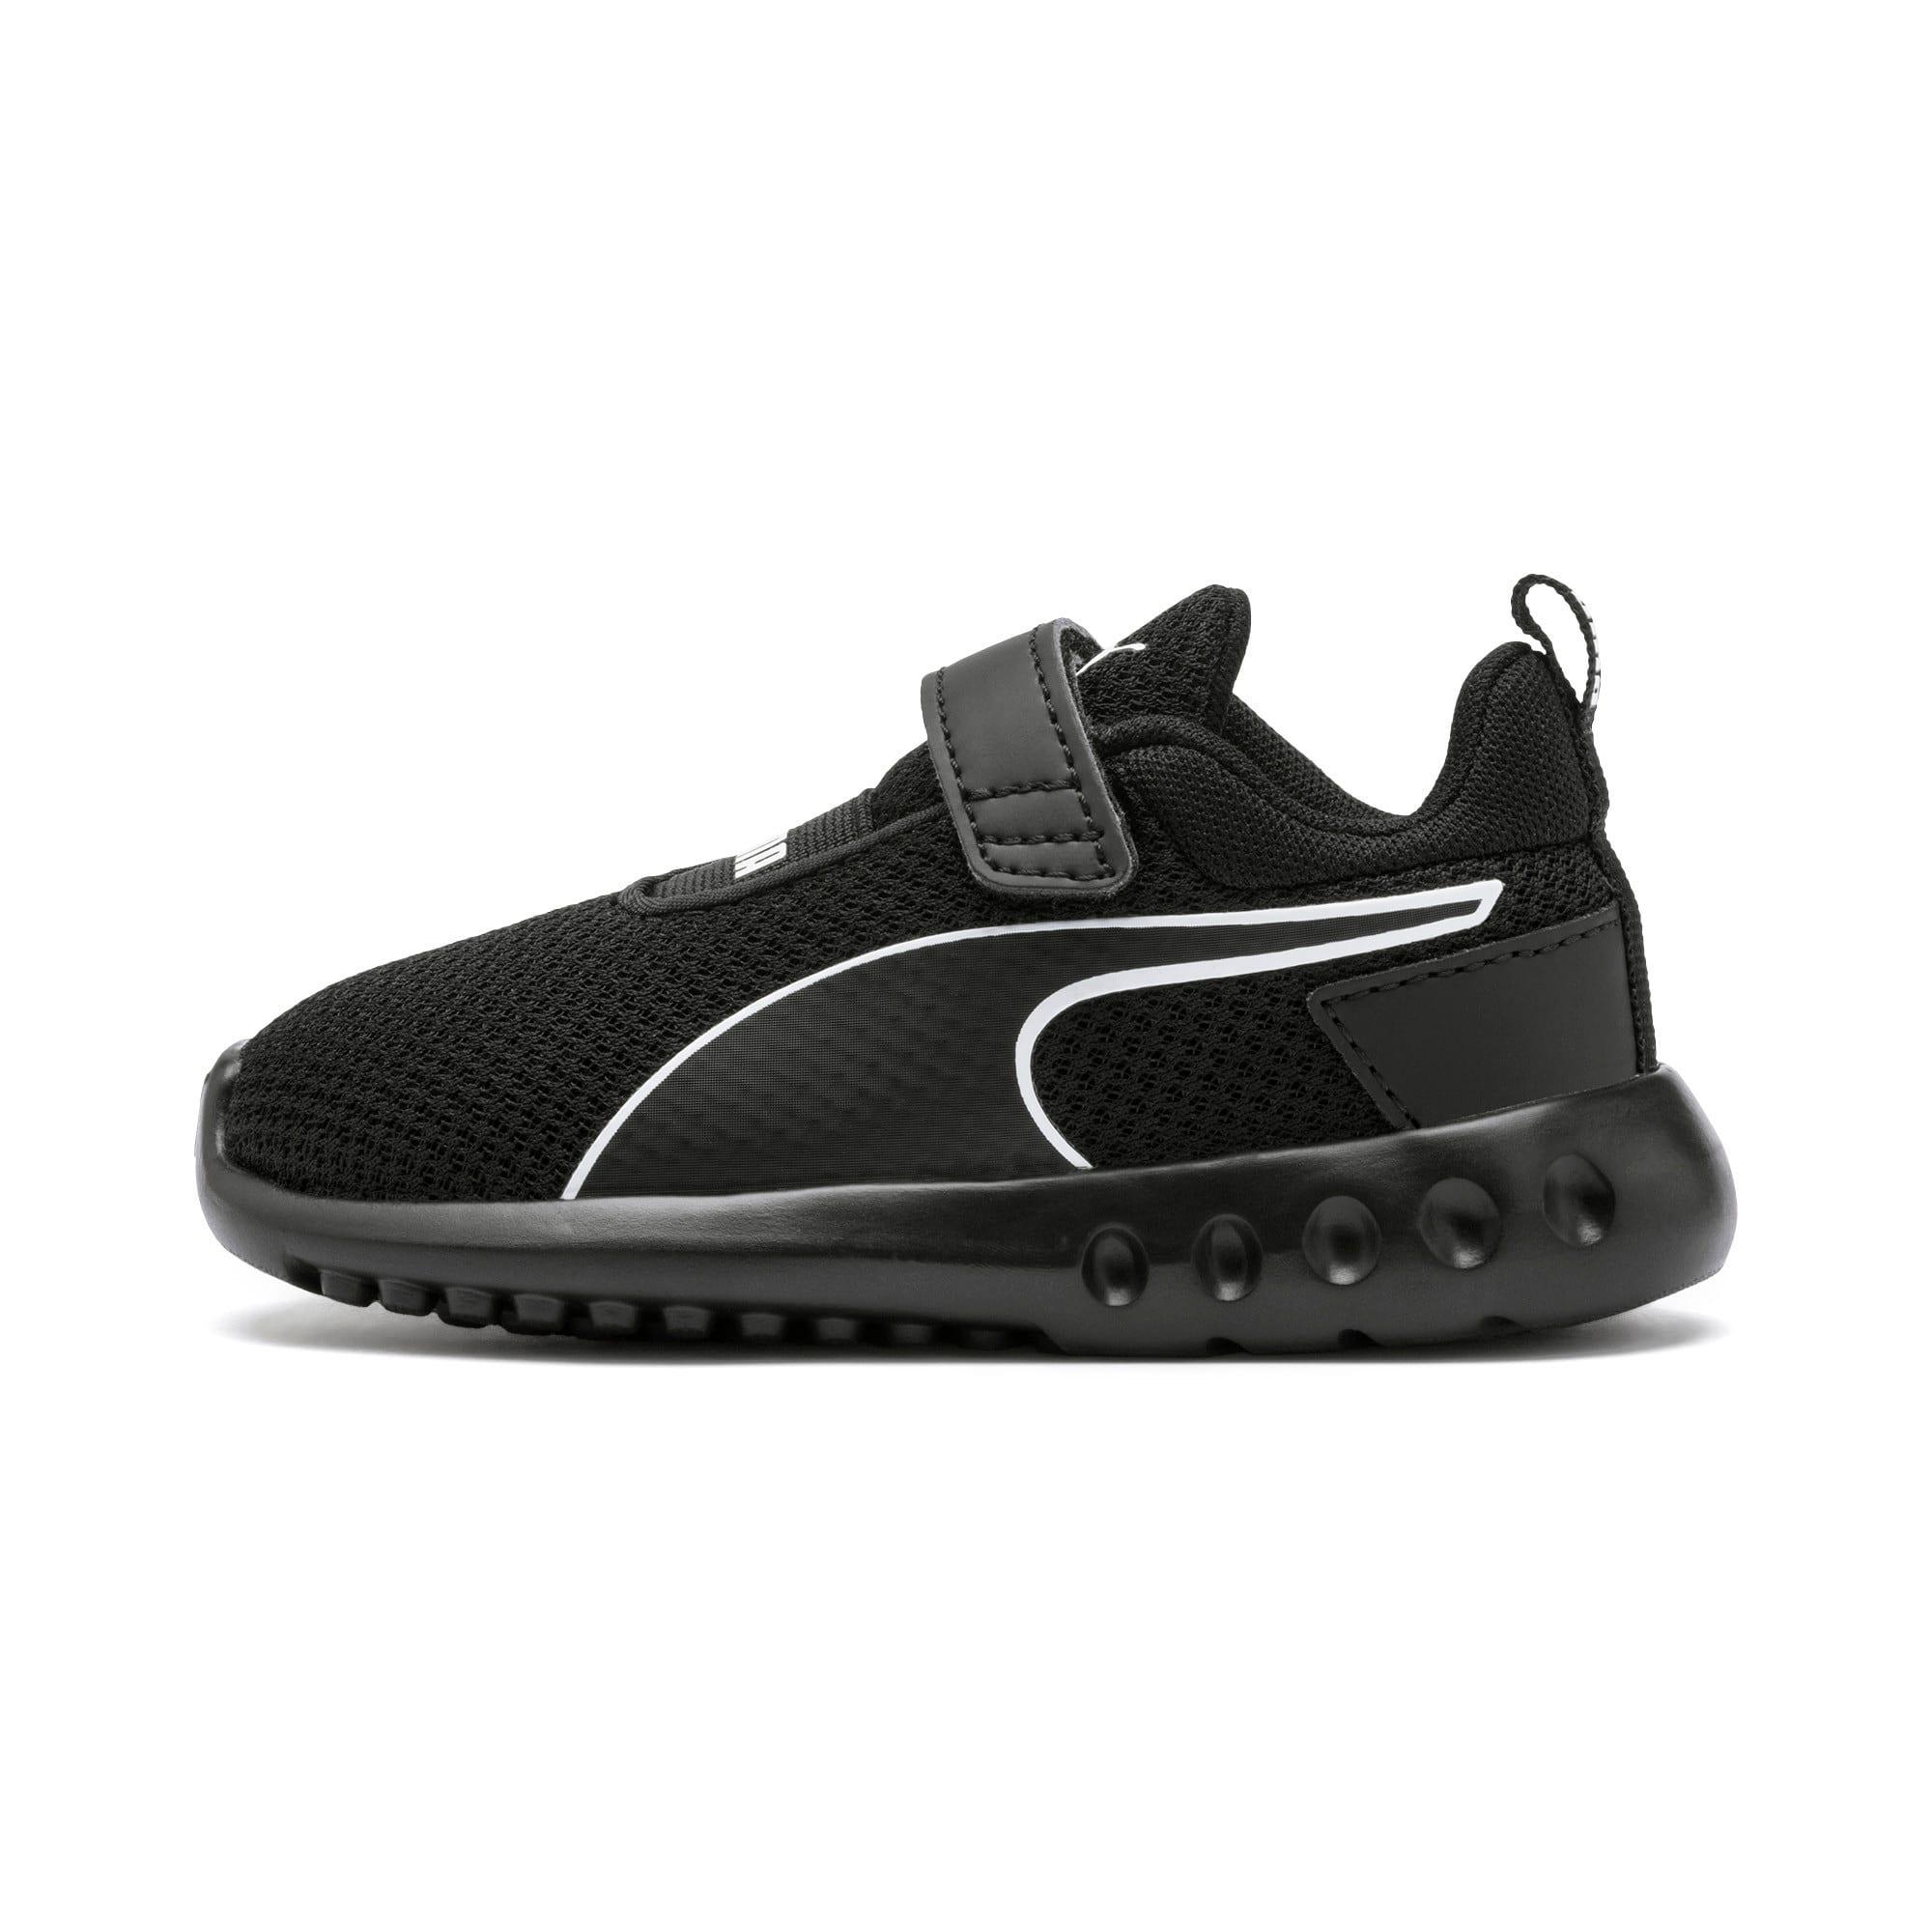 Thumbnail 1 of Carson 2 Concave V Babies Sneaker, Puma Black, medium